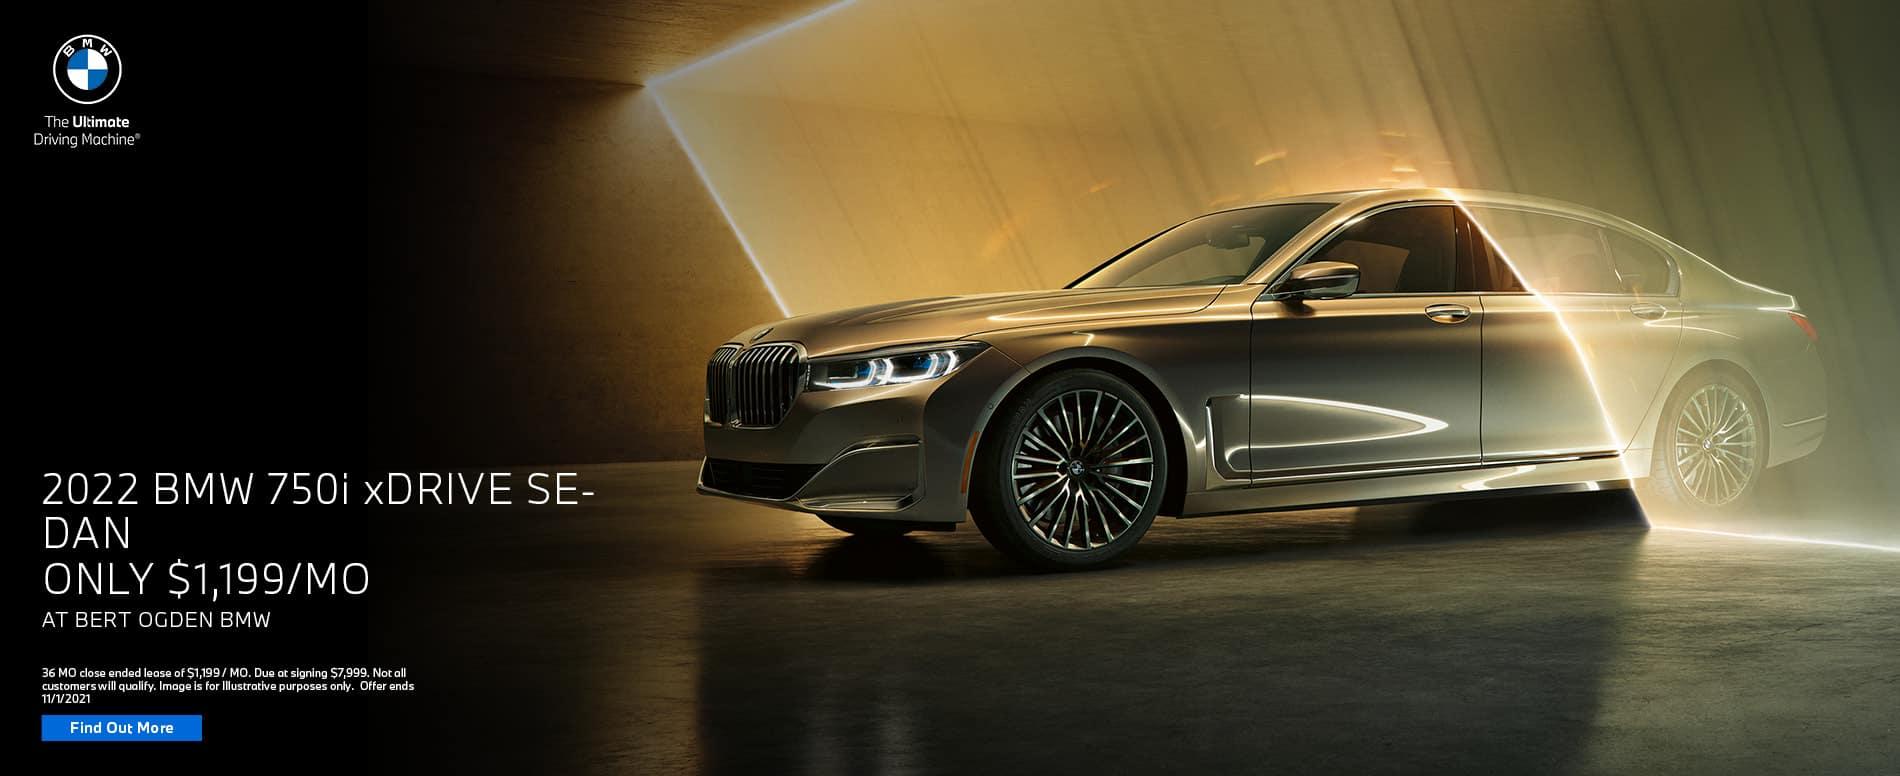 2022 BMW 750i xDrive Sedan Offer   Bert Ogden BMW in McAllen, Texas